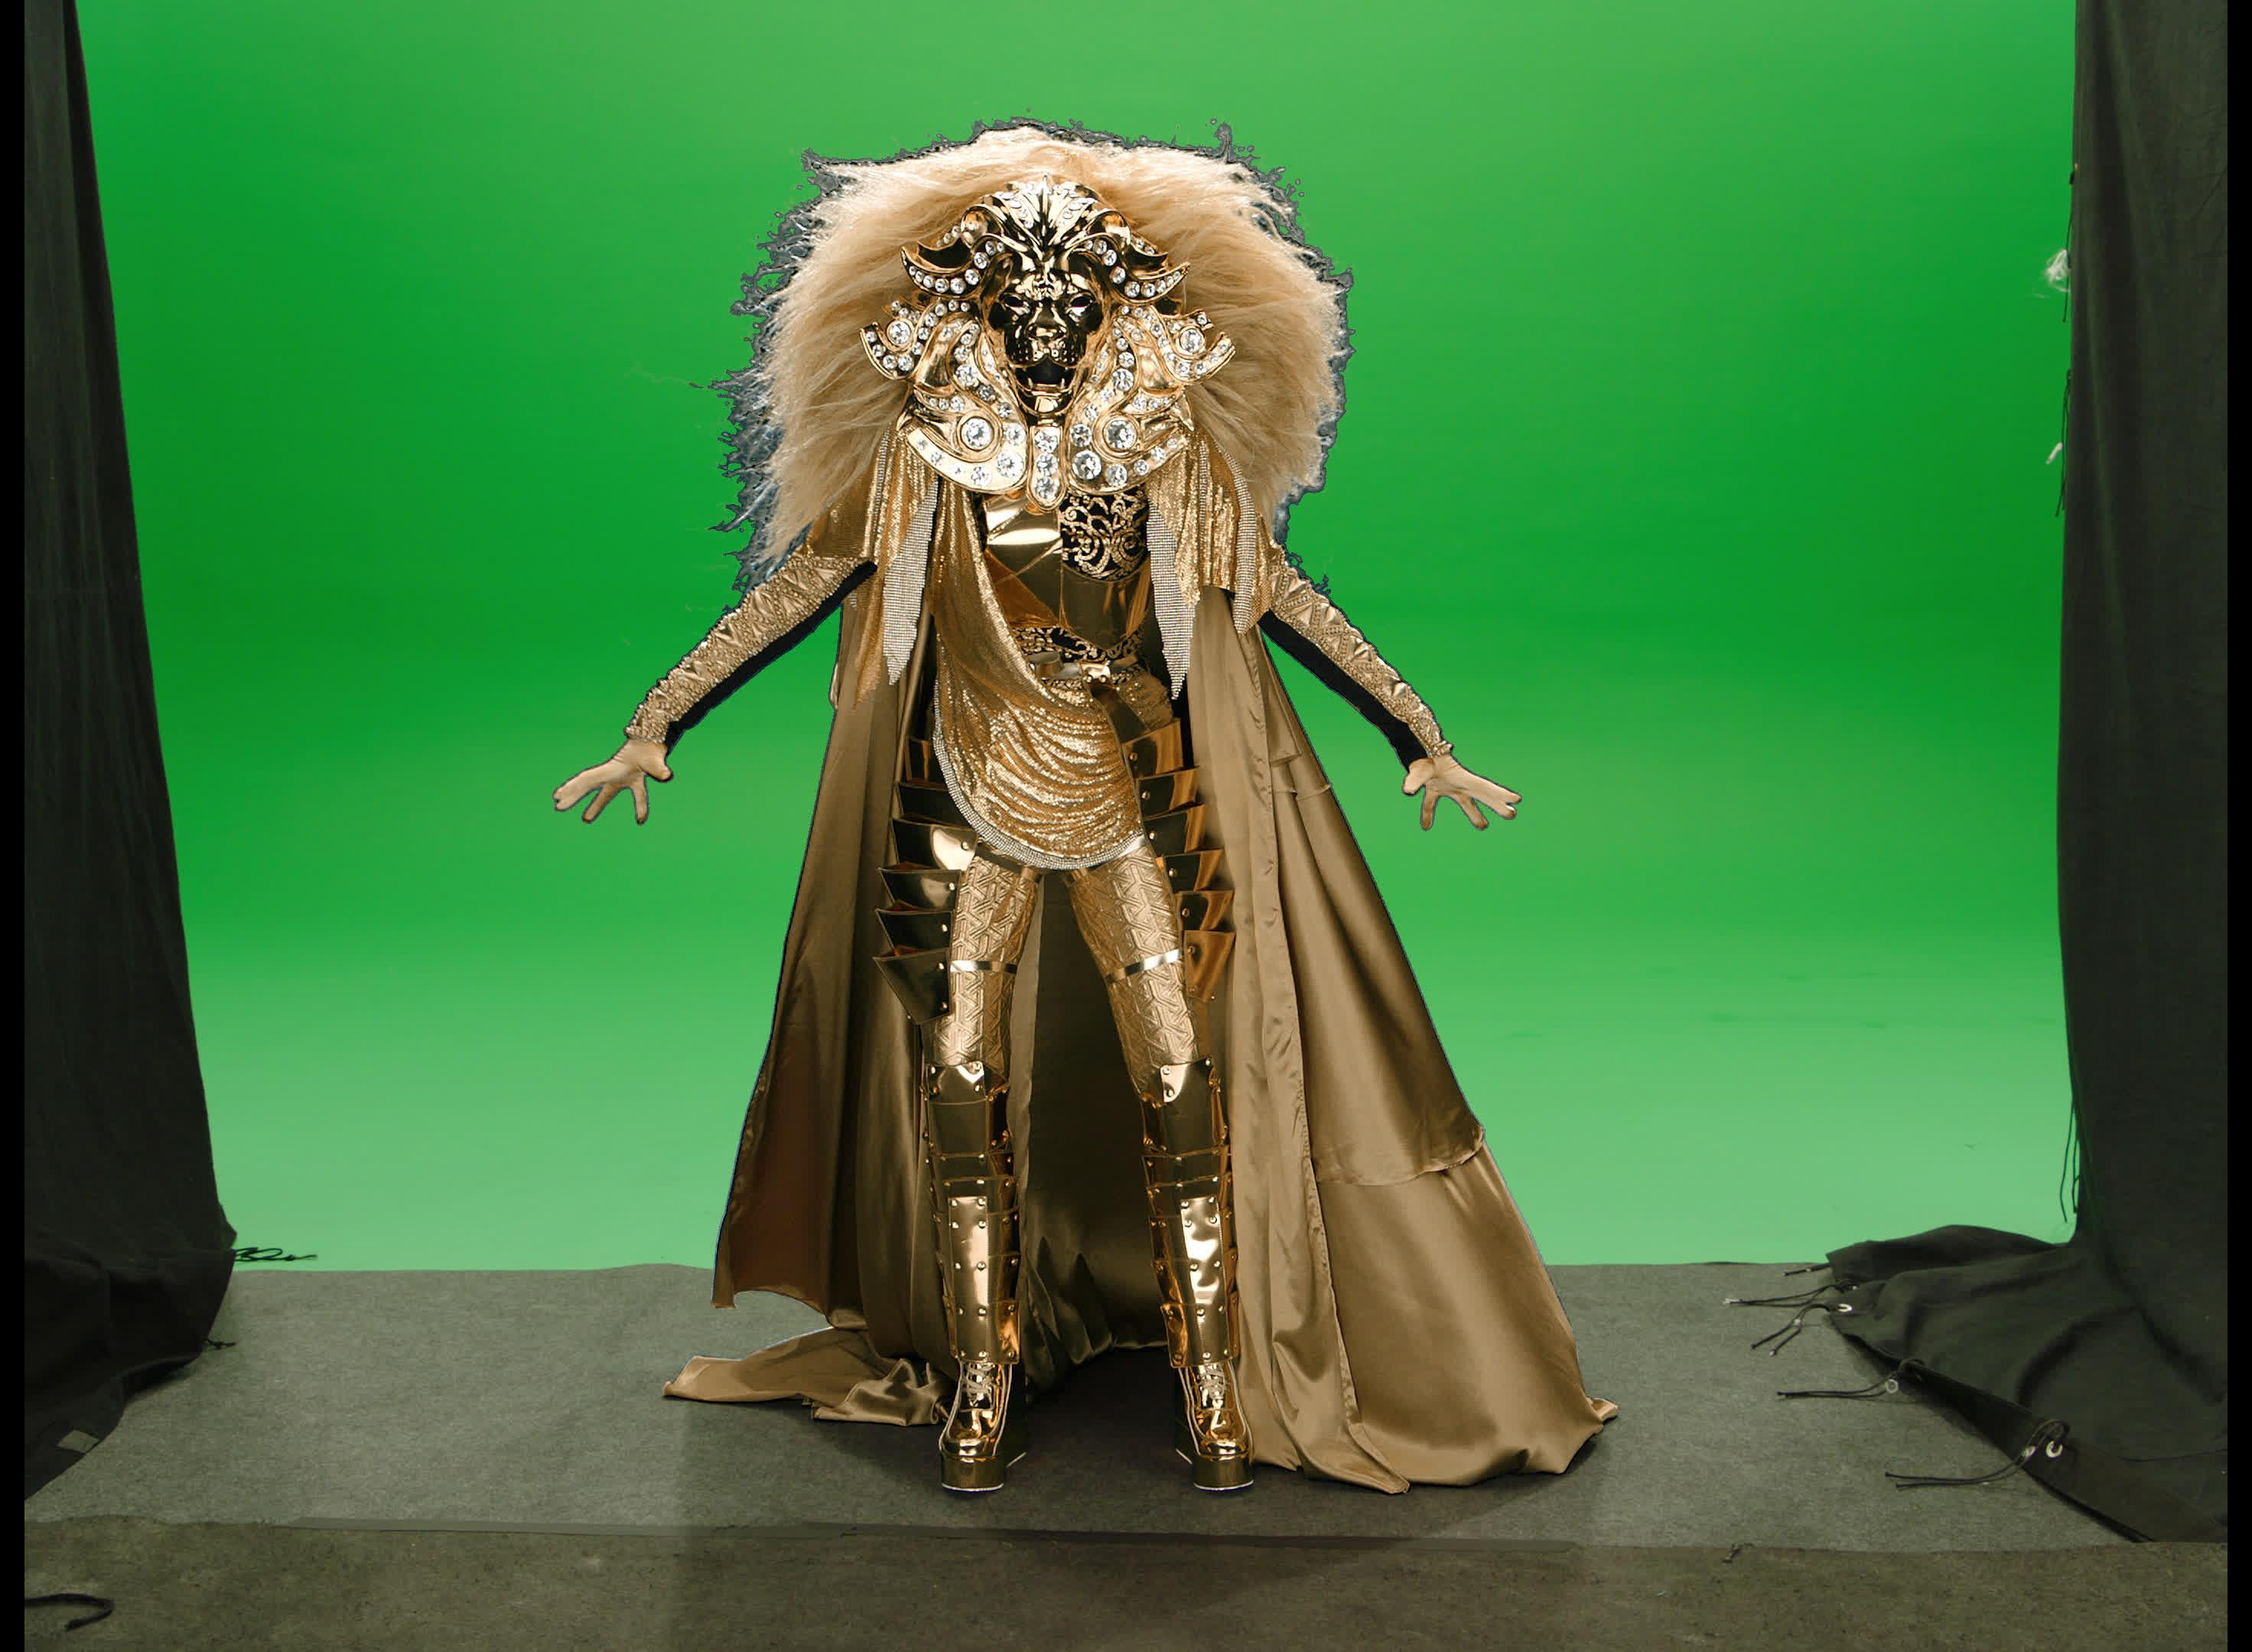 cat, lion, masked singer, pose, posing, the masked singer, the masked singer on fox, waiting, Lion Waiting GIFs